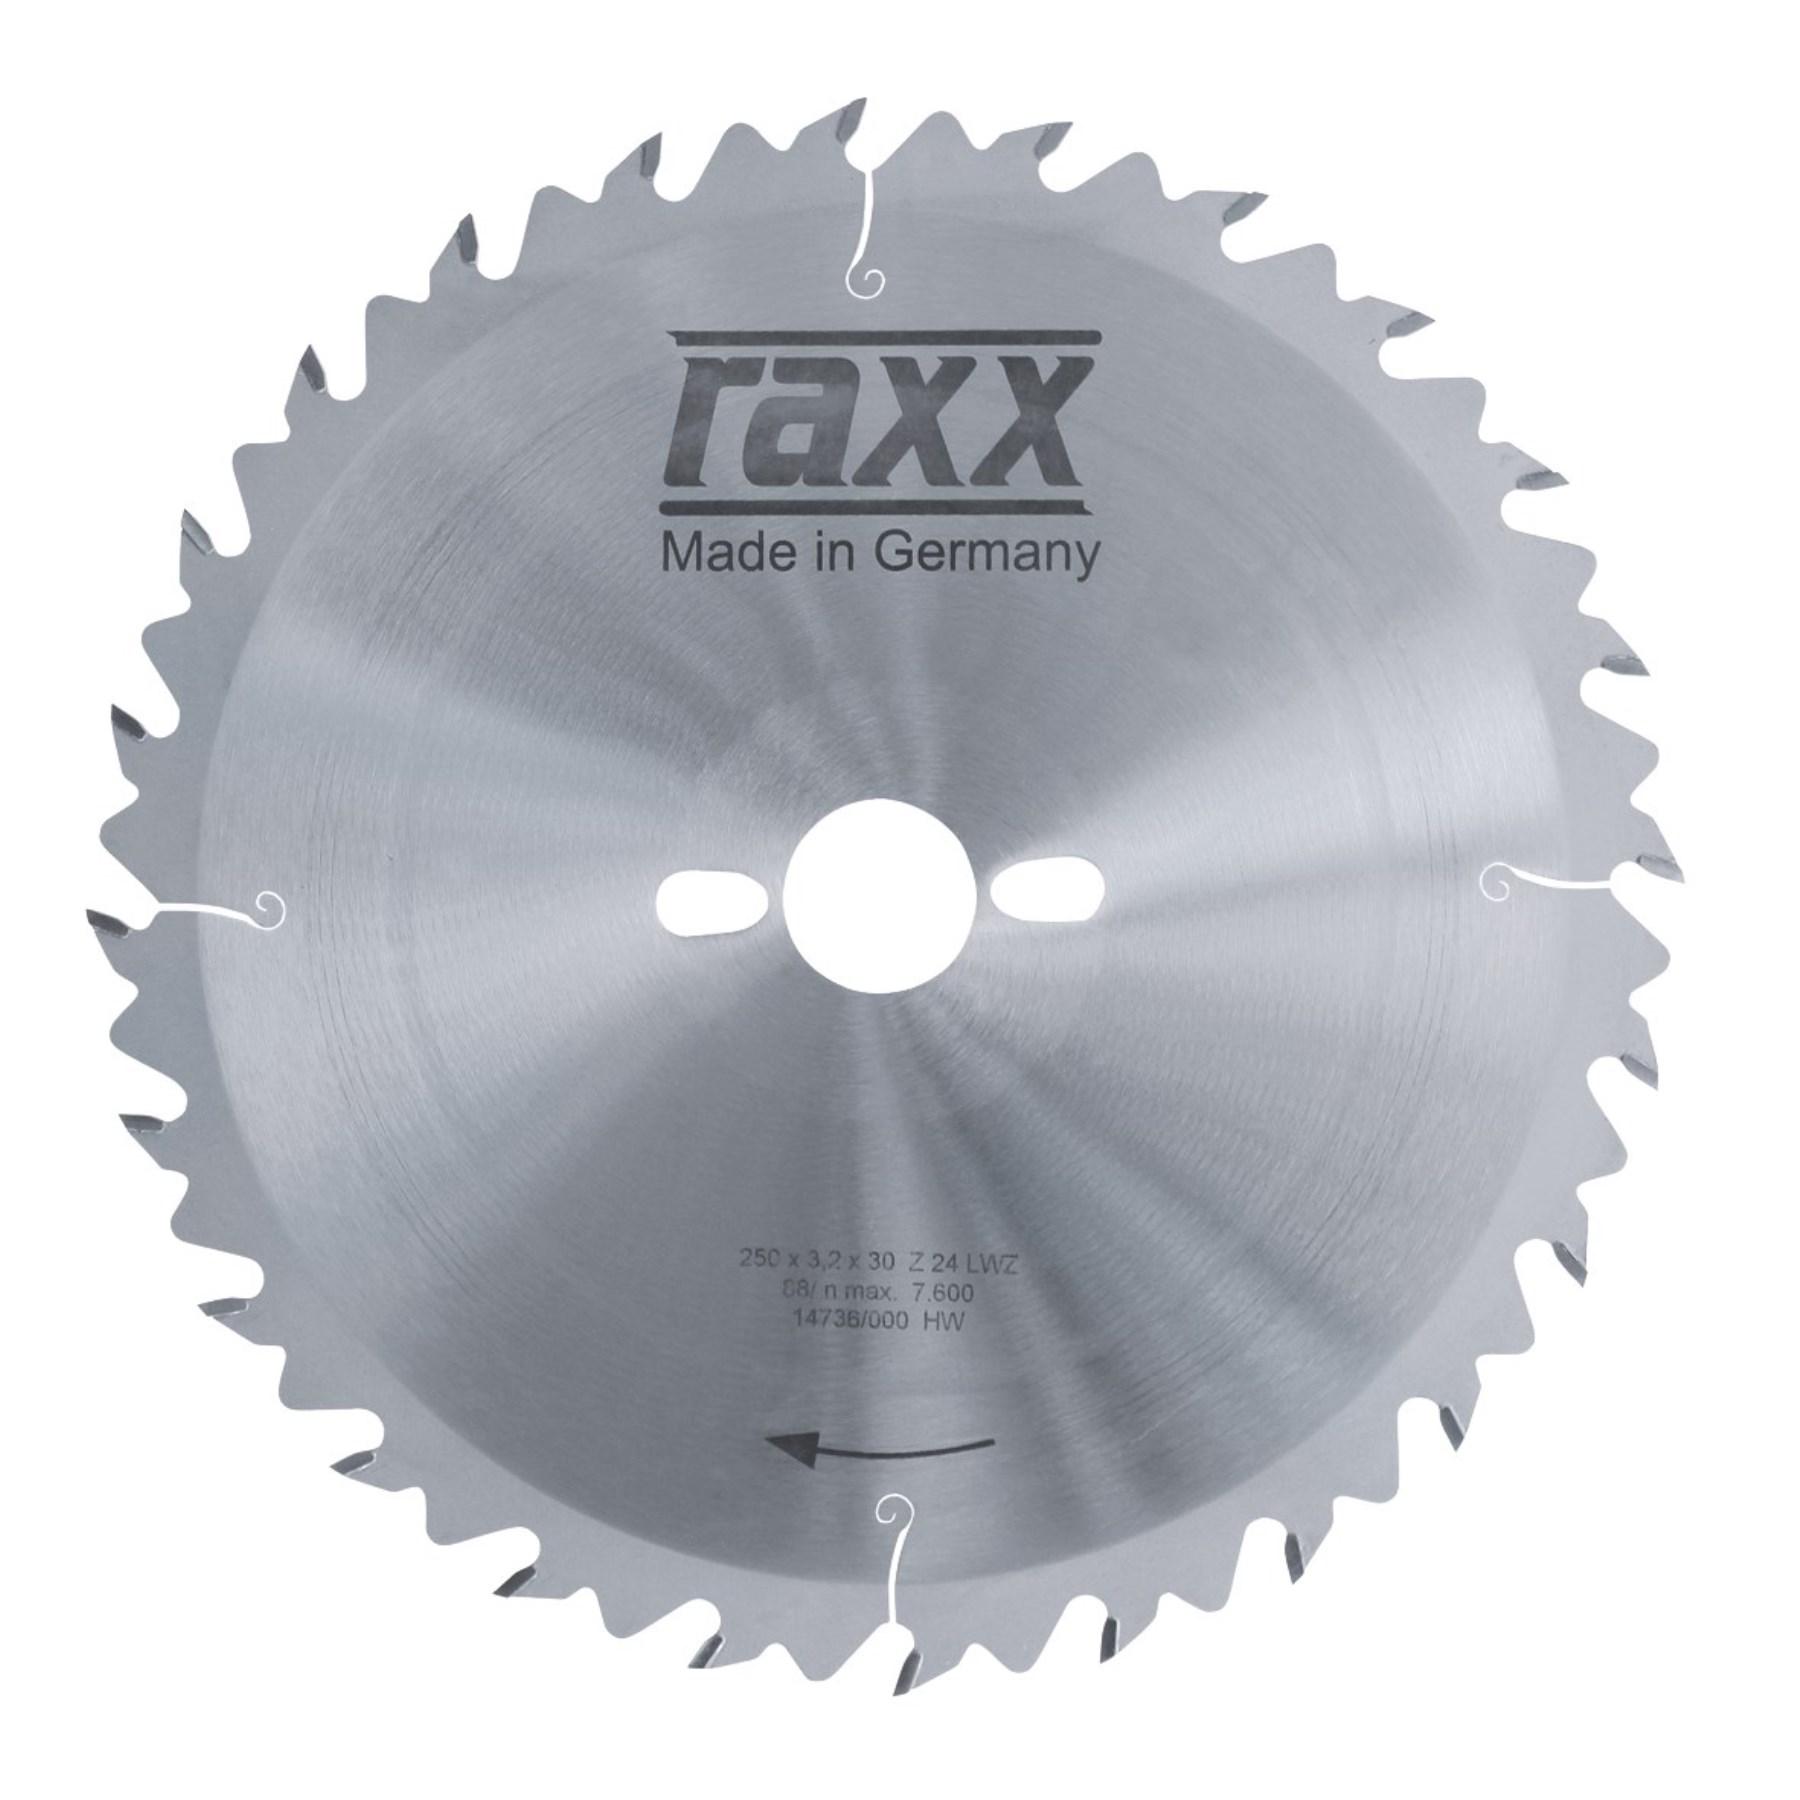 RAXX 1205064 kotouč k okružní pile HM 400x3,5x30 [ 42400300360060400 ]